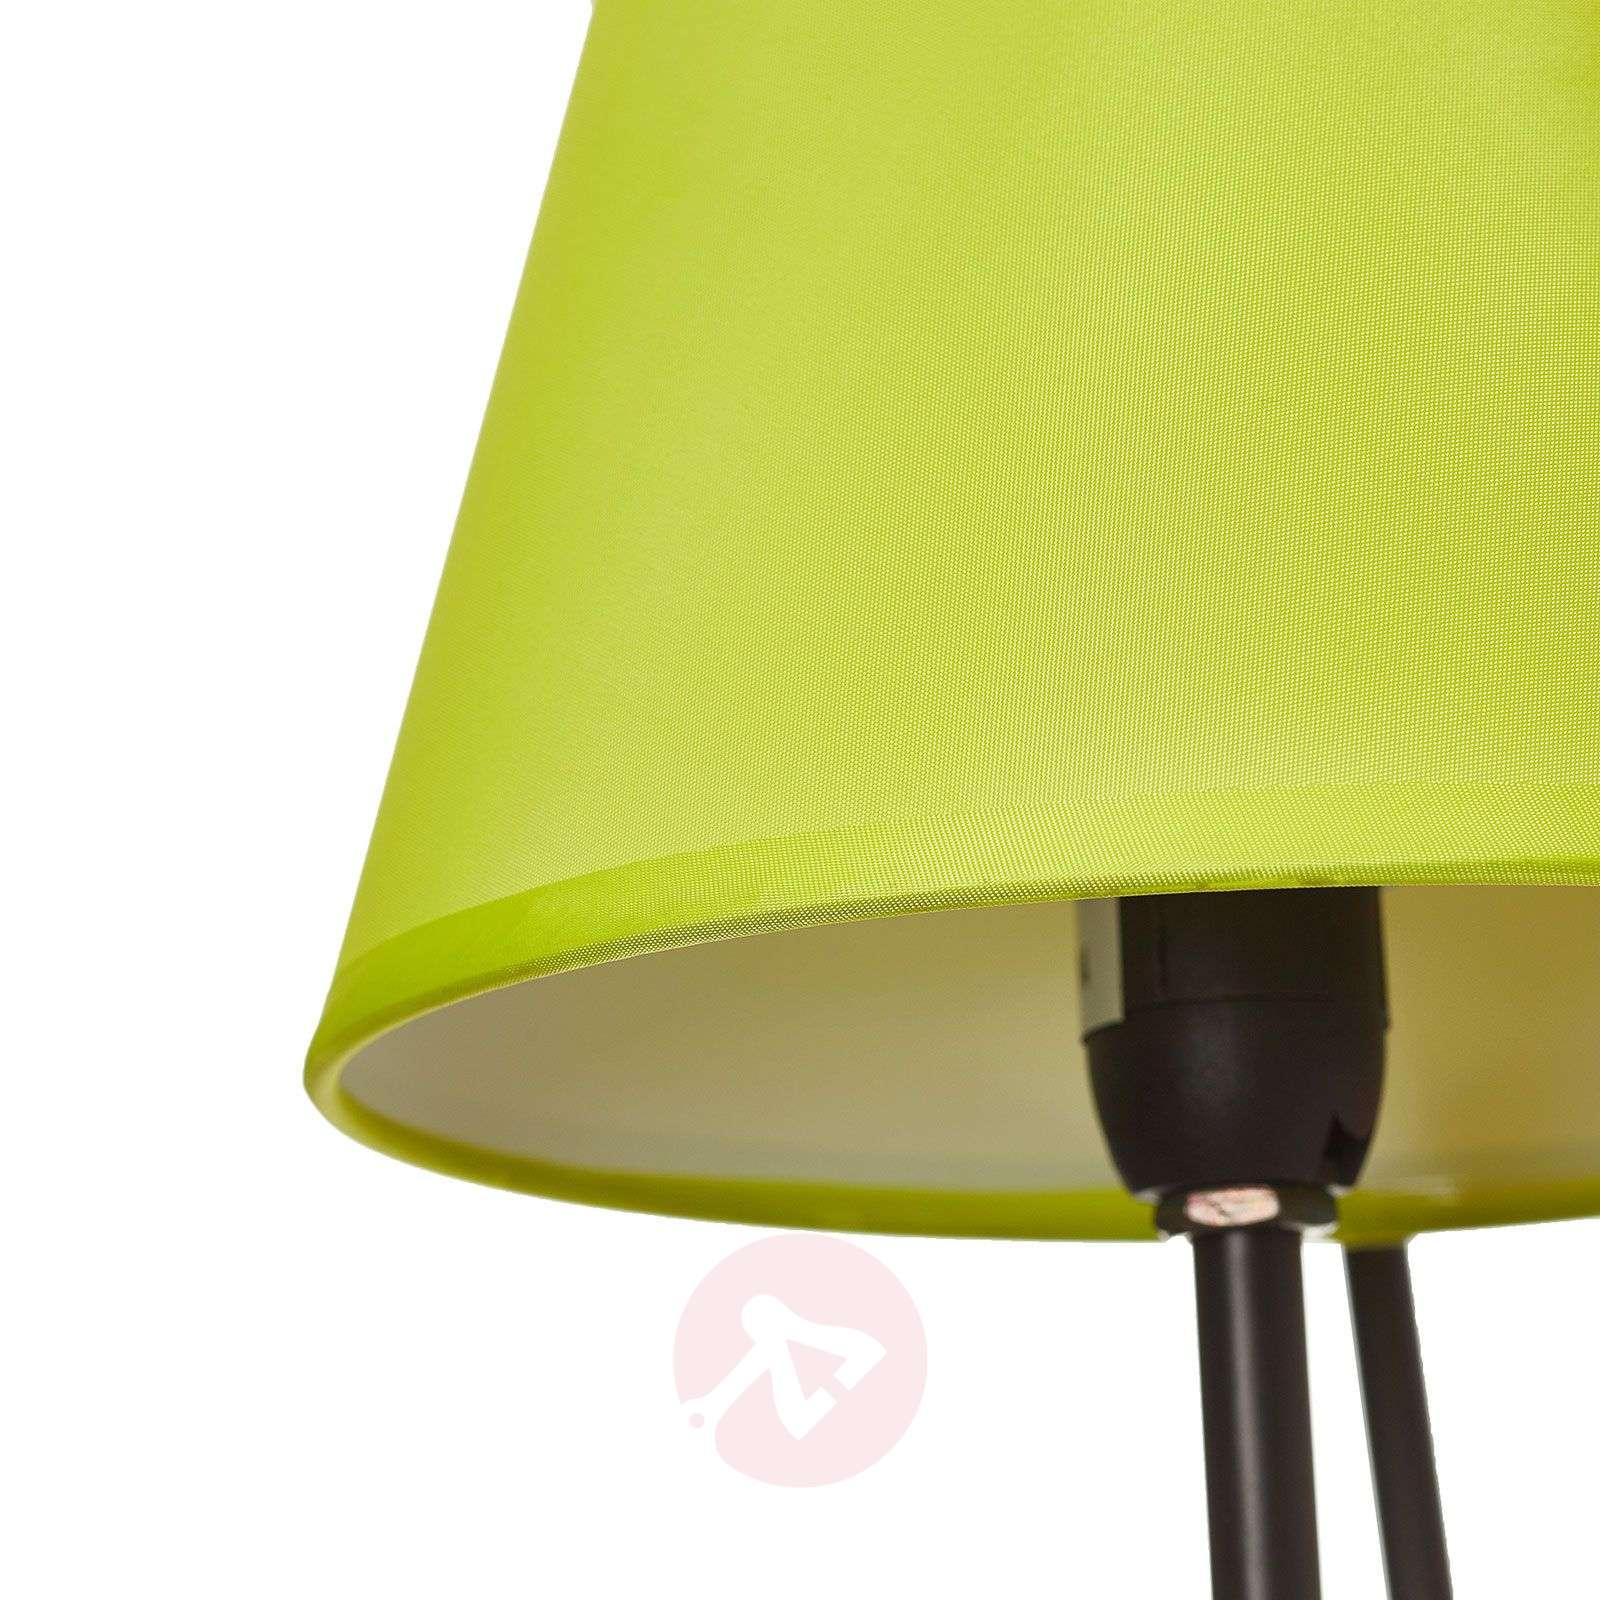 Colori fabric floor lamp 5-bulb colourful-7000999-03